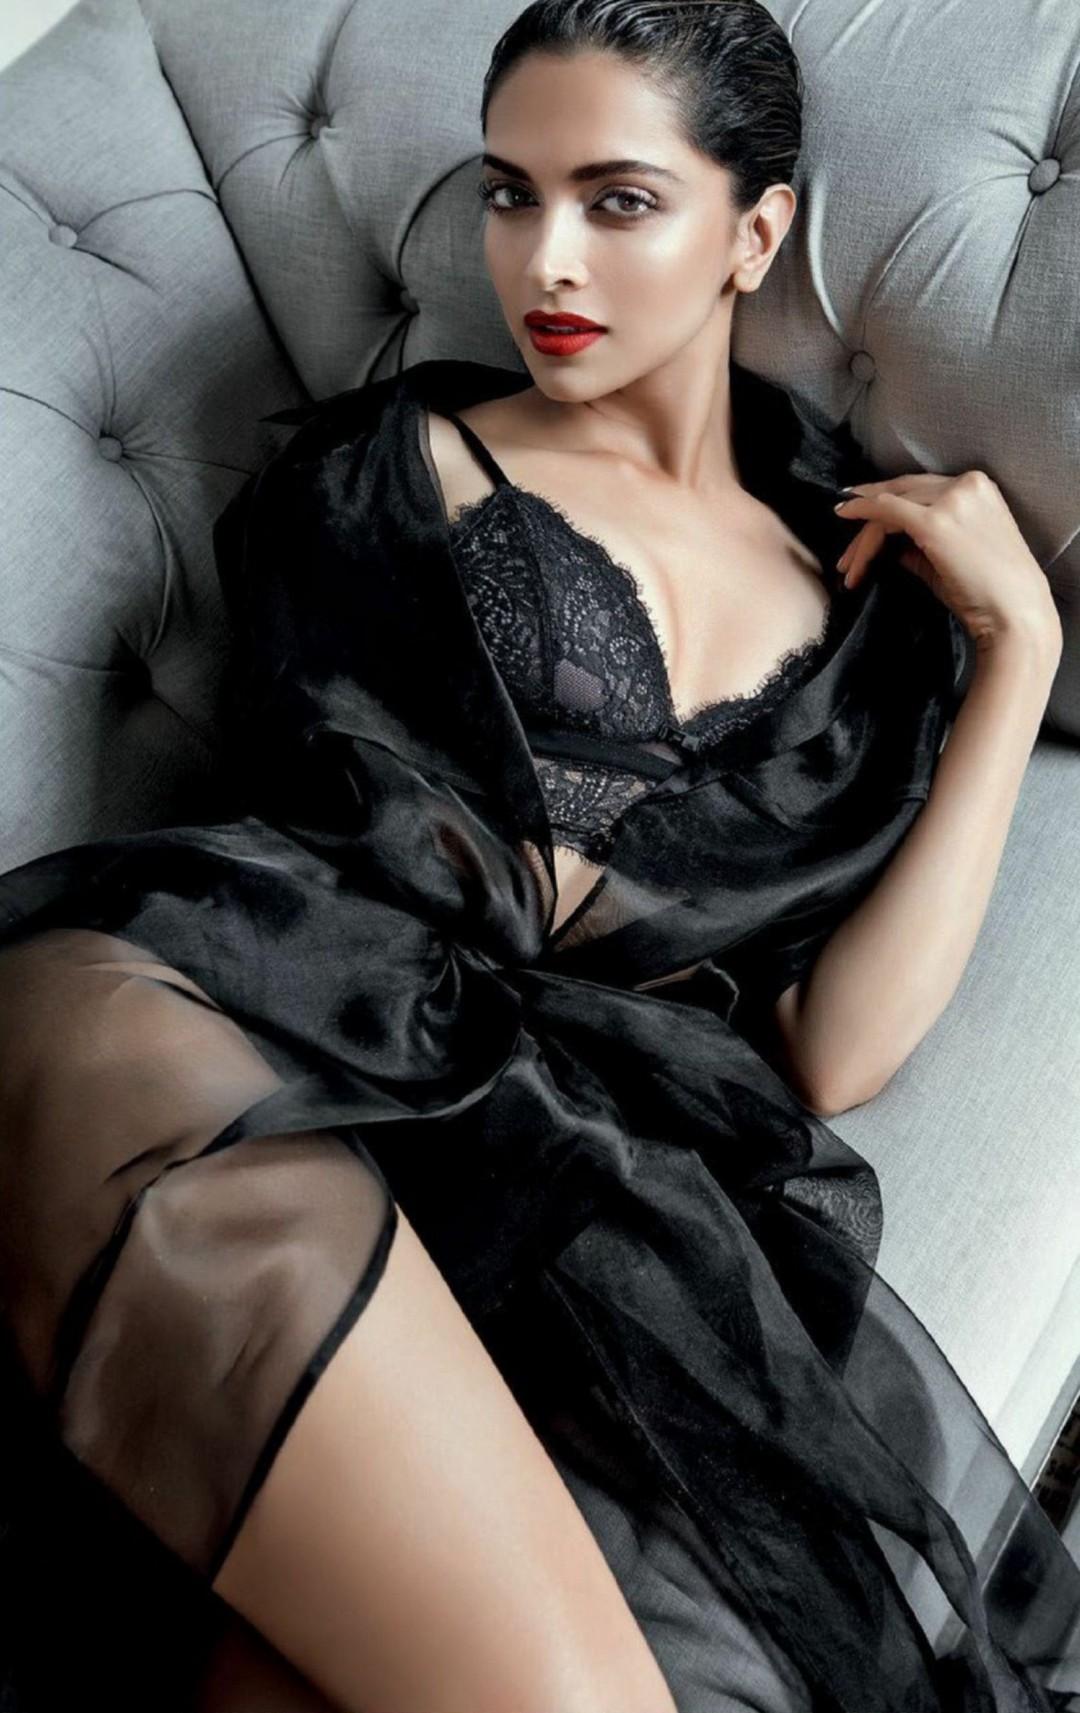 Deepikapadukone sexy